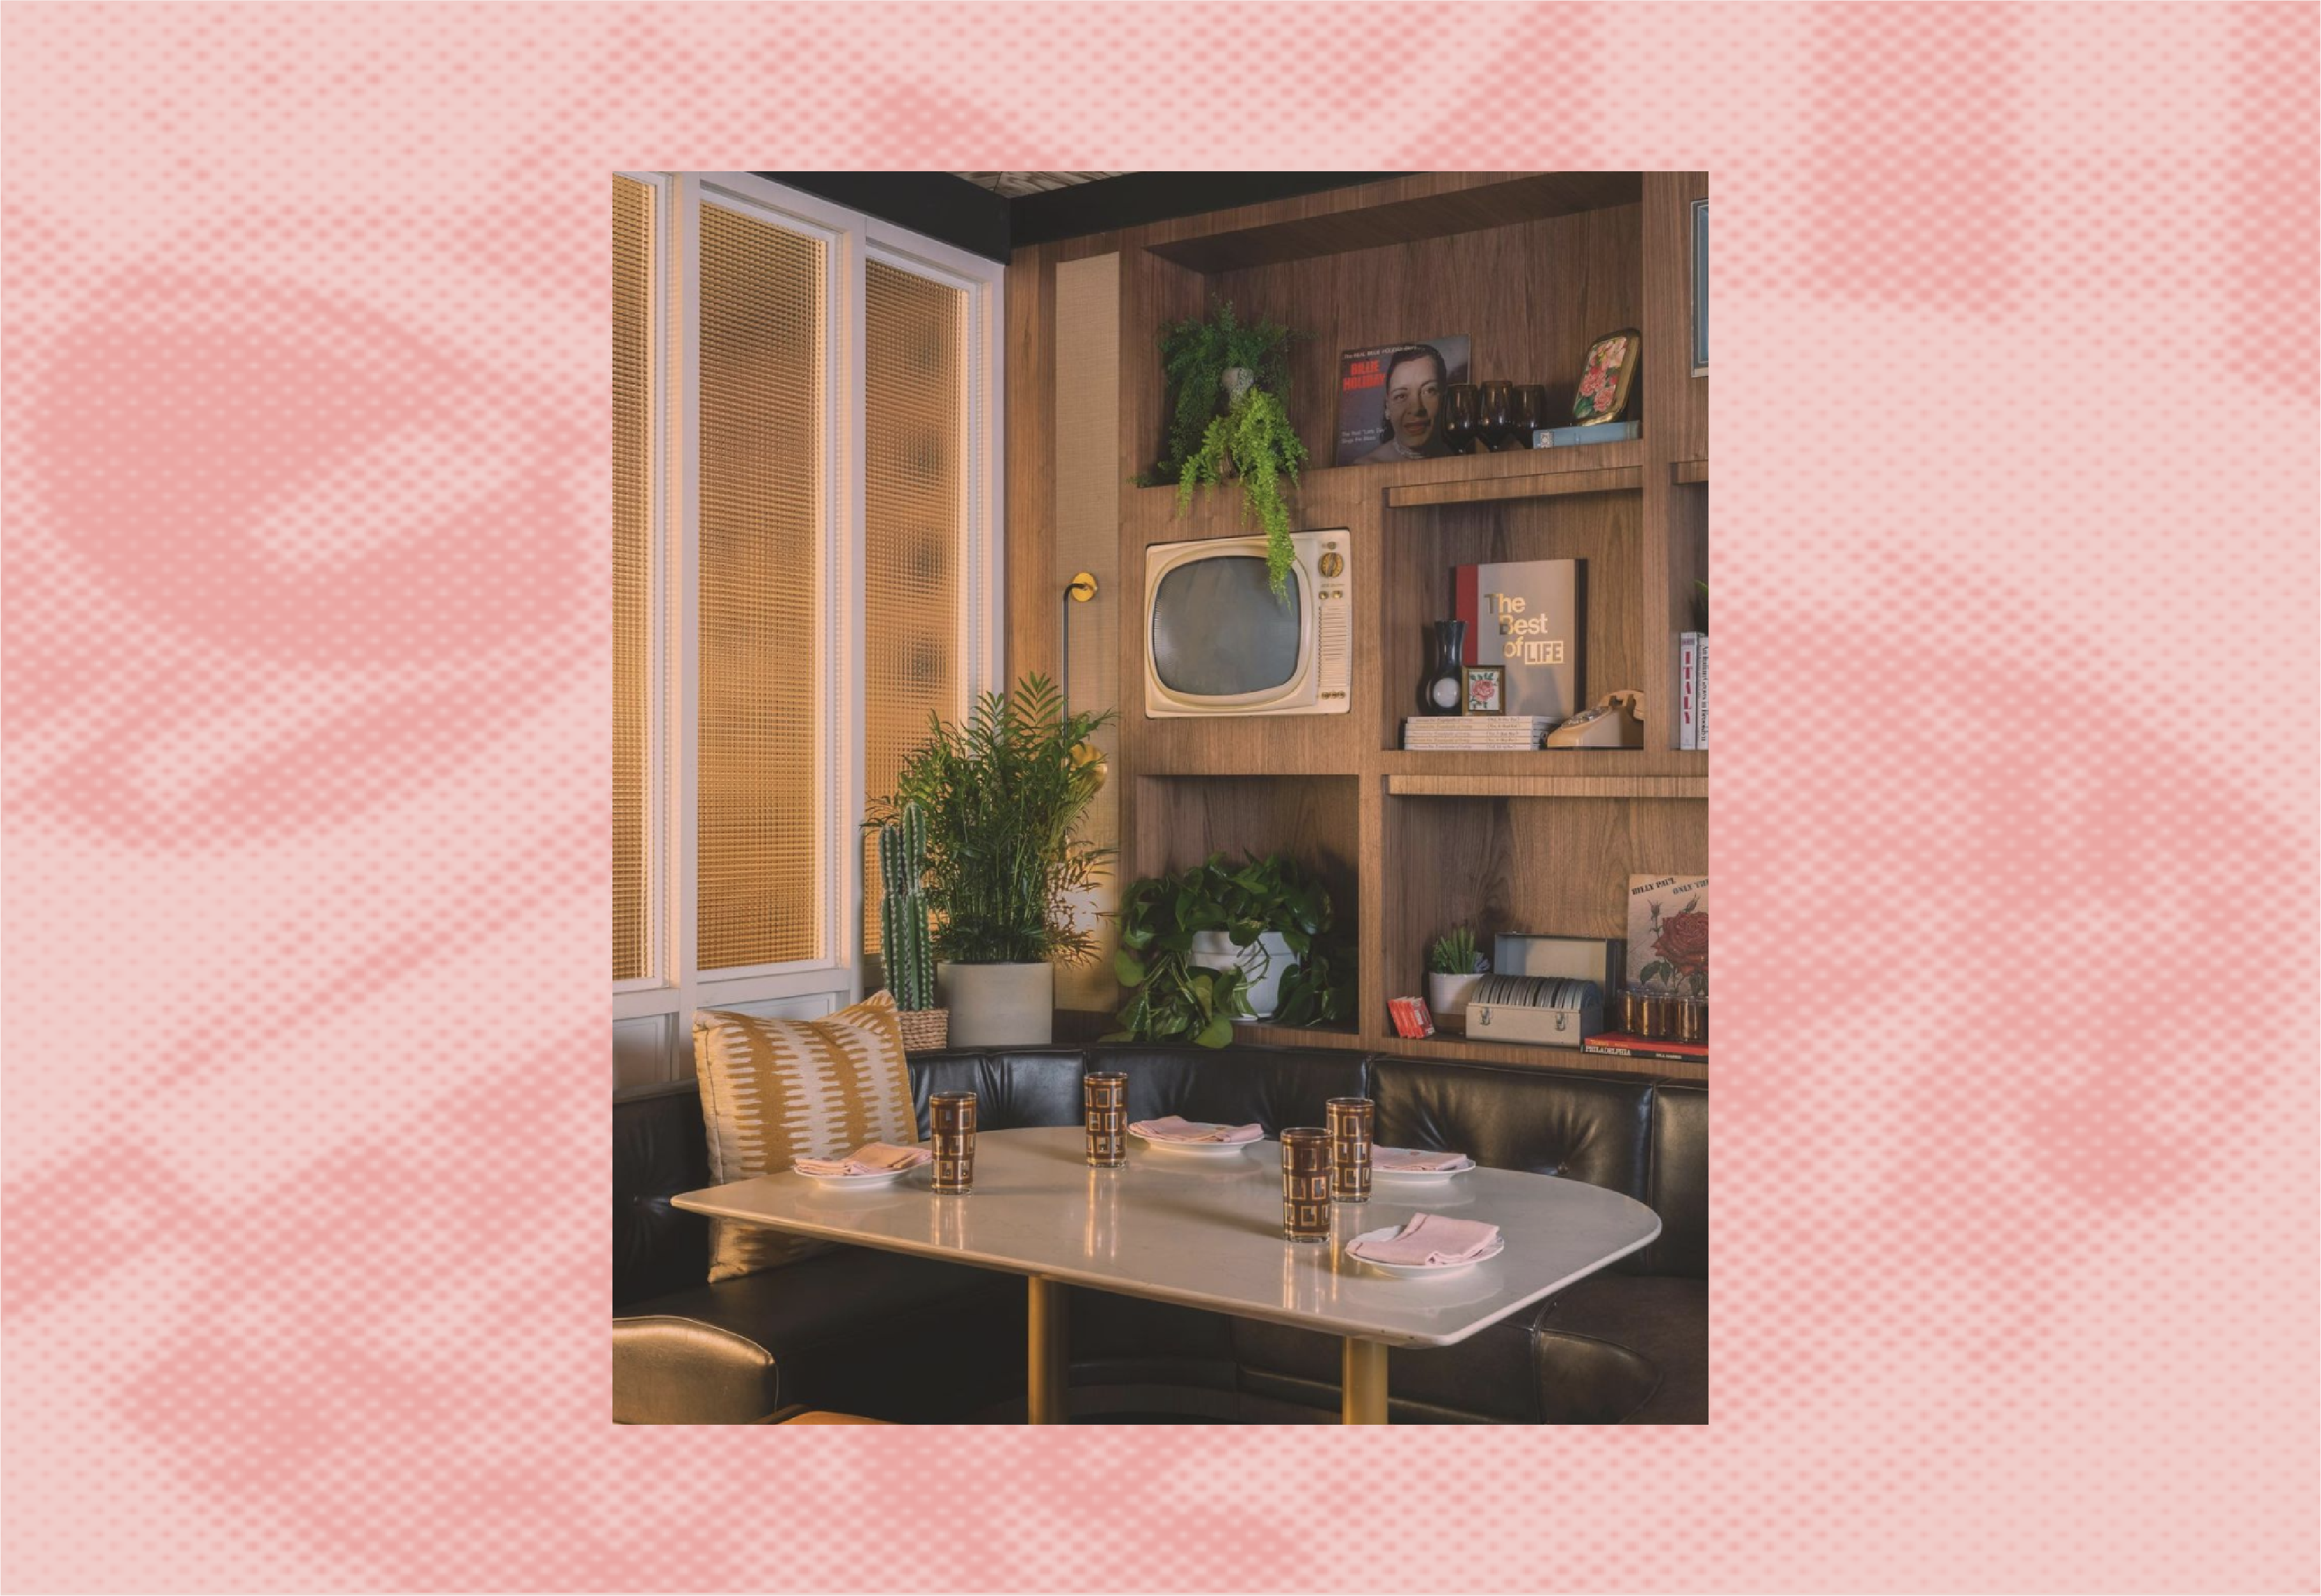 amenities-Image-halftone-5-08